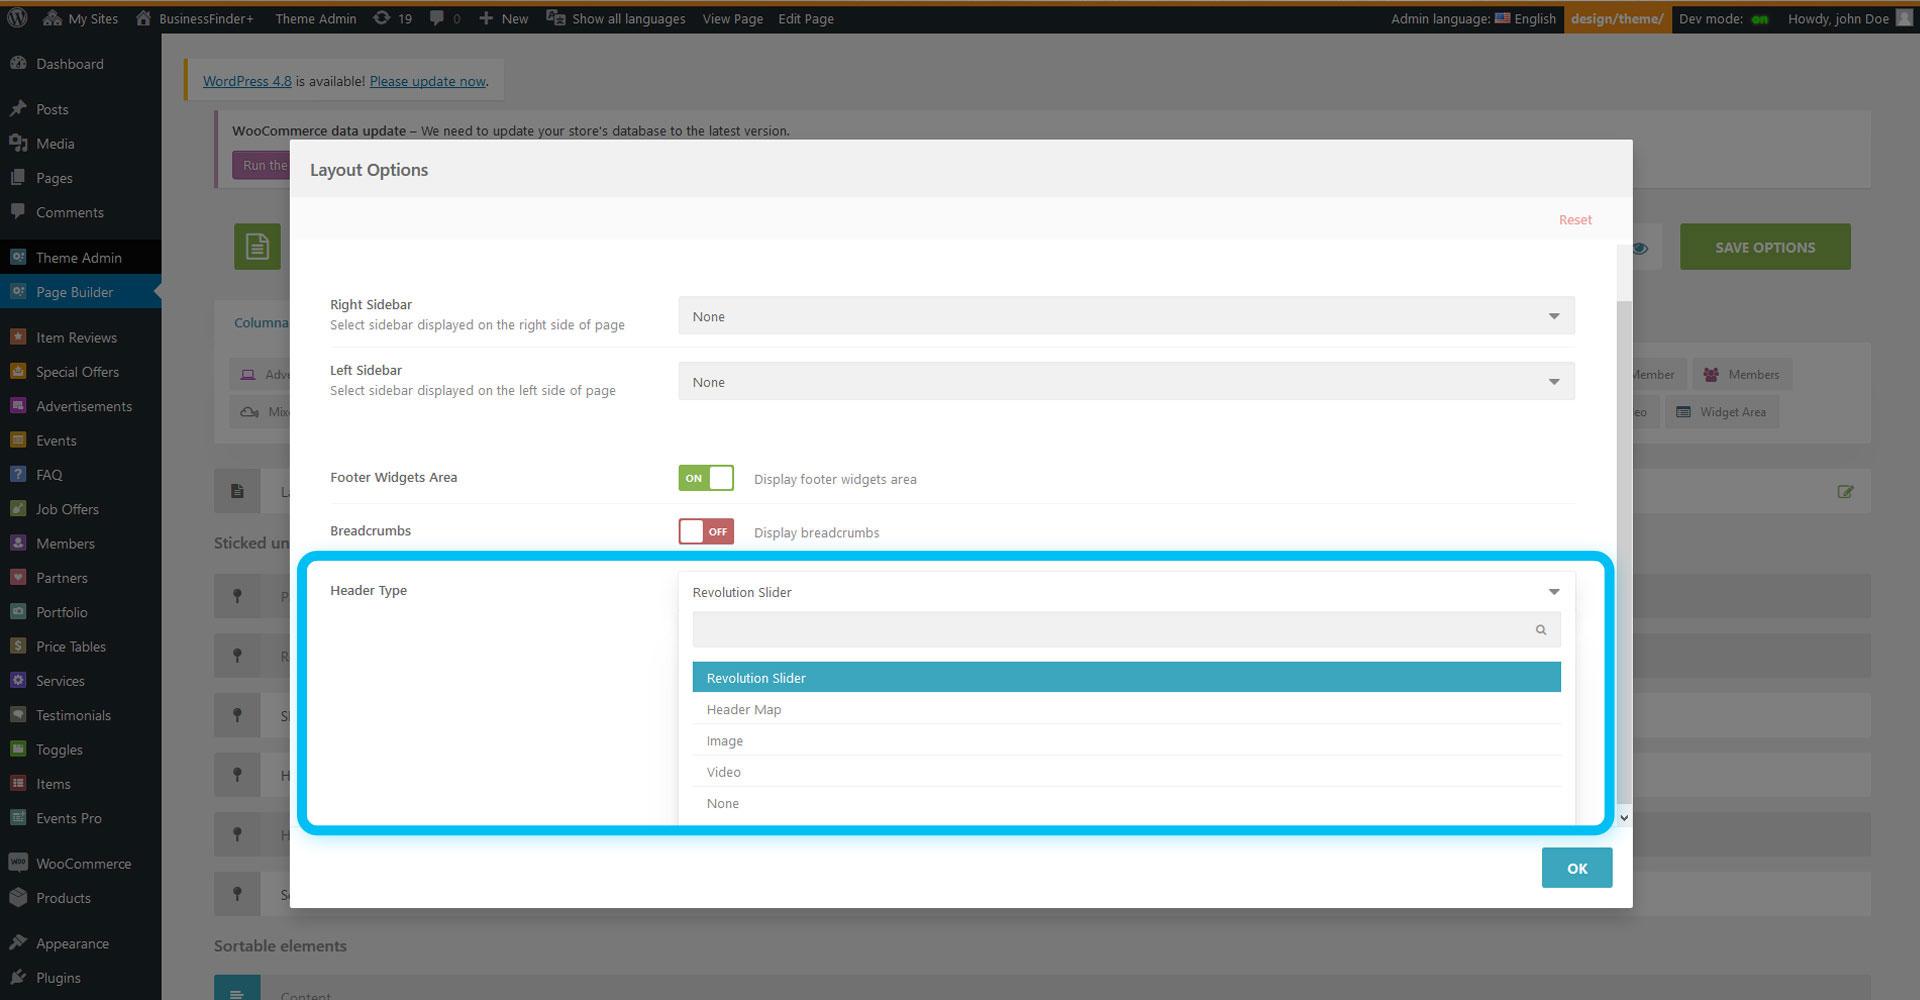 Revolution Slider adds dynamics to your WordPress Theme